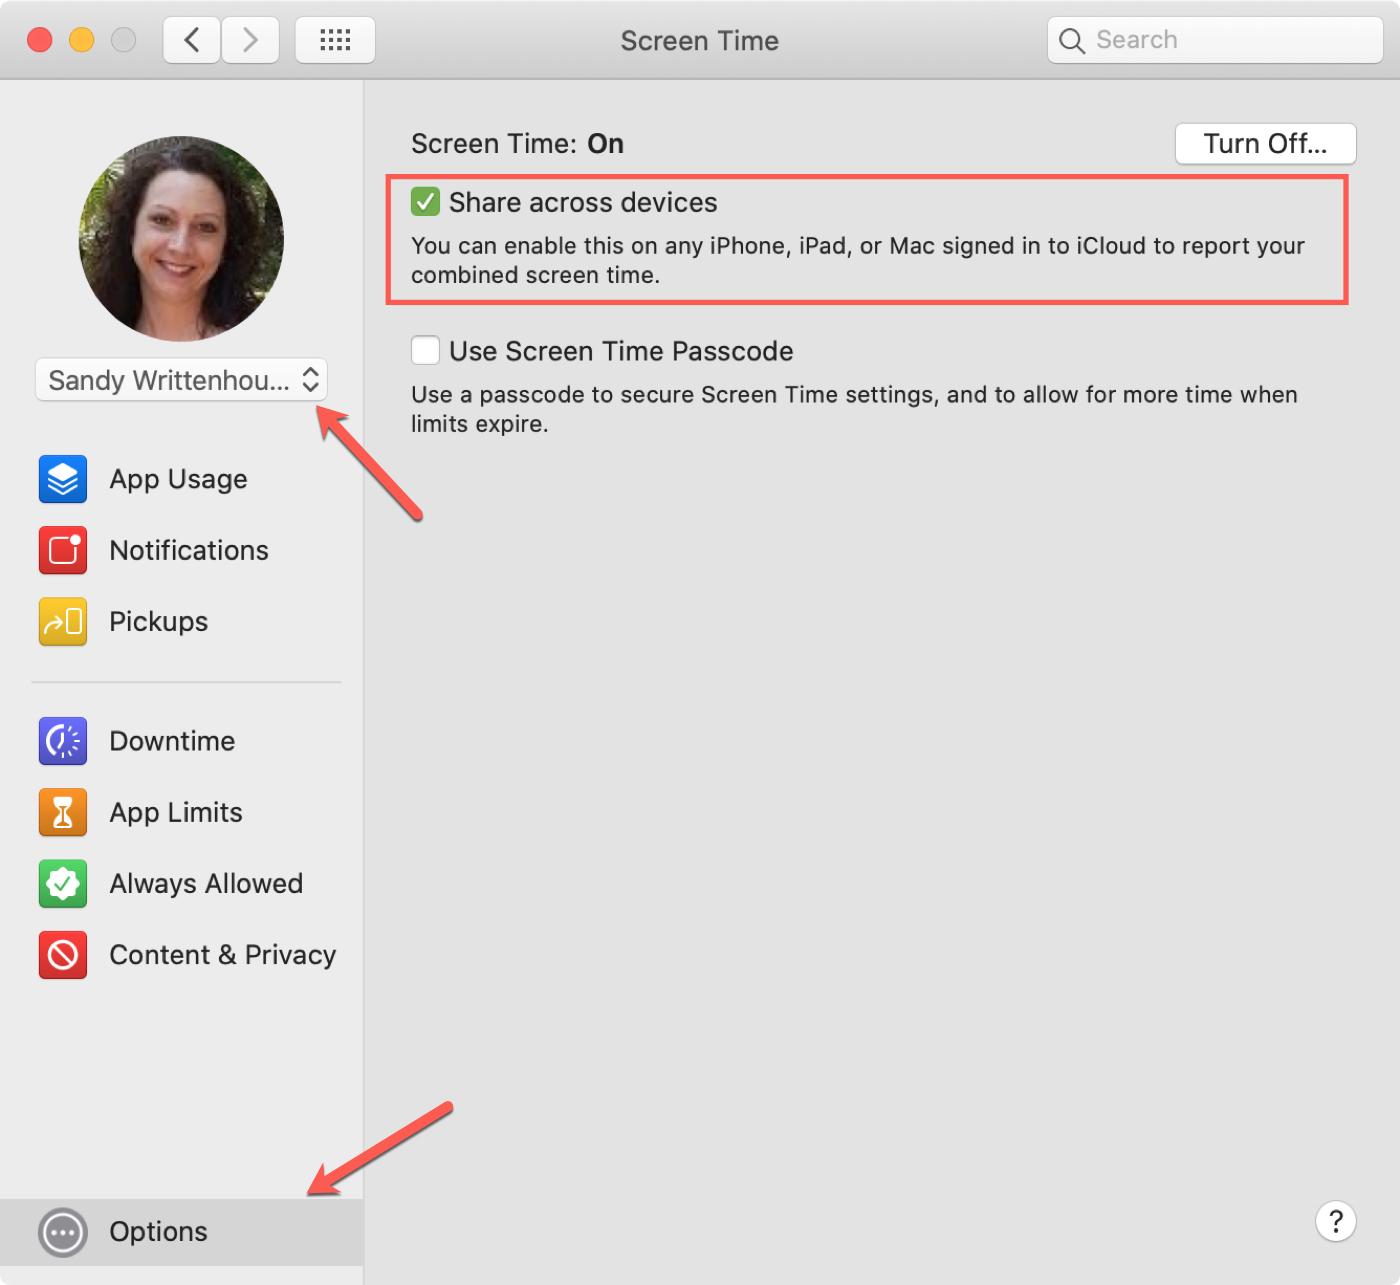 Screen Time Options on Mac